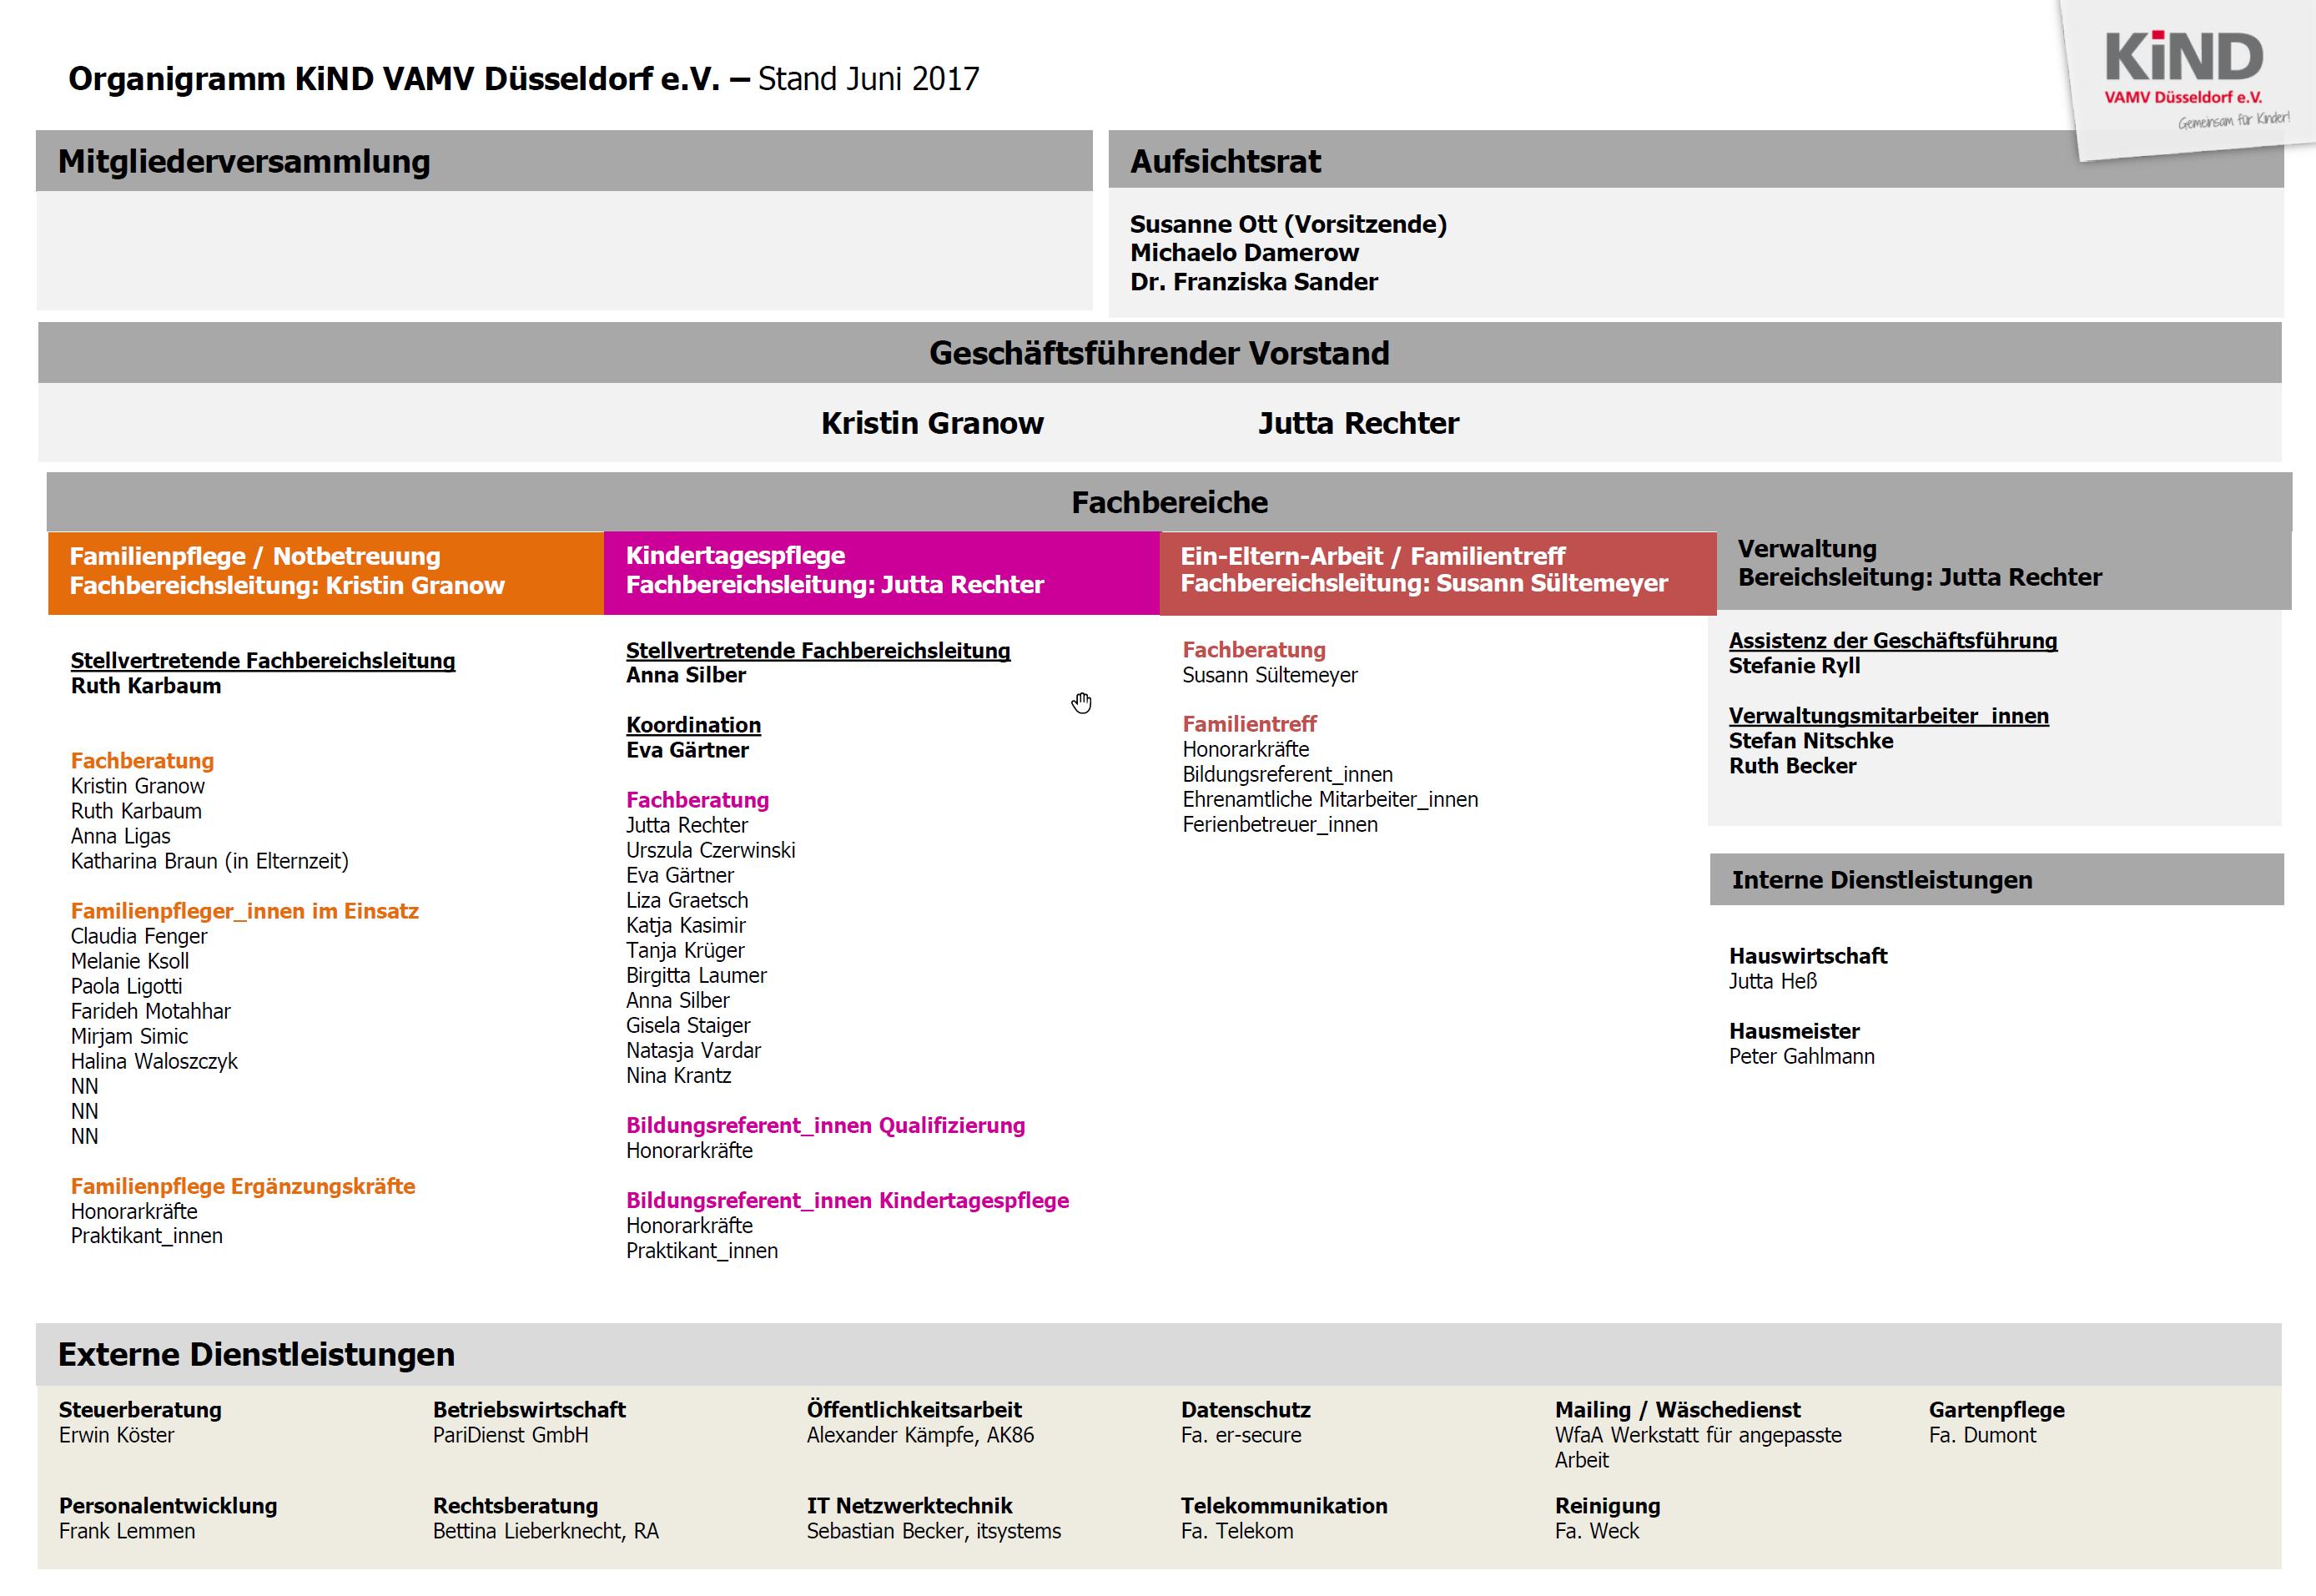 KiND-VAMV-DuesseldorfeV-Organigramm